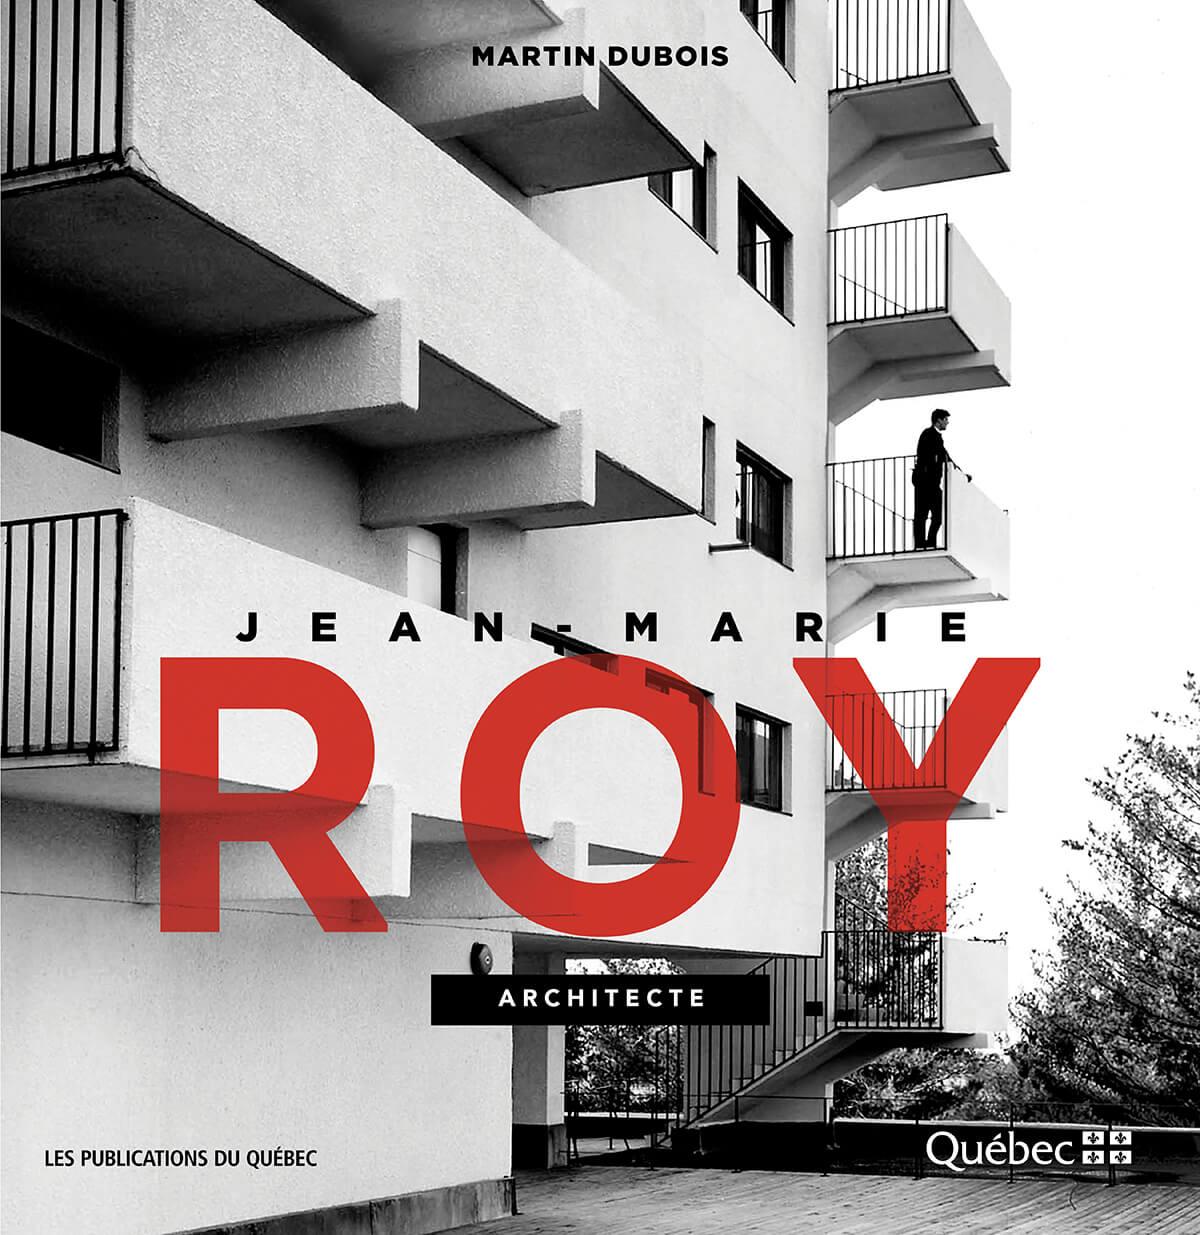 Jean-Marie Roy, architecte